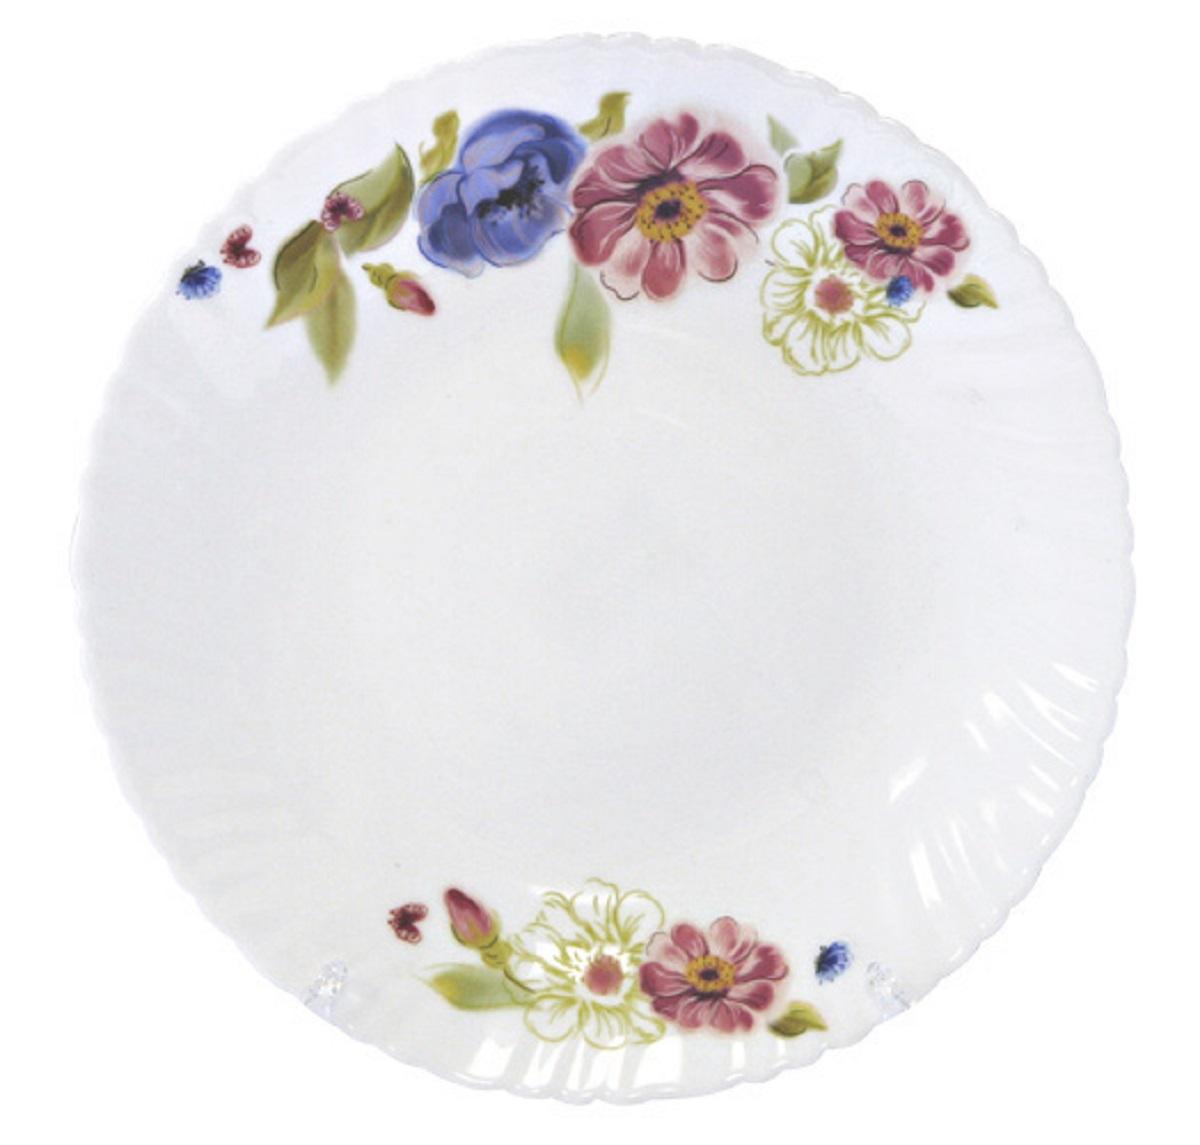 Тарелка обеденная Chinbull Луара, диаметр 24 см тарелка обеденная chinbull лоран диаметр 23 см